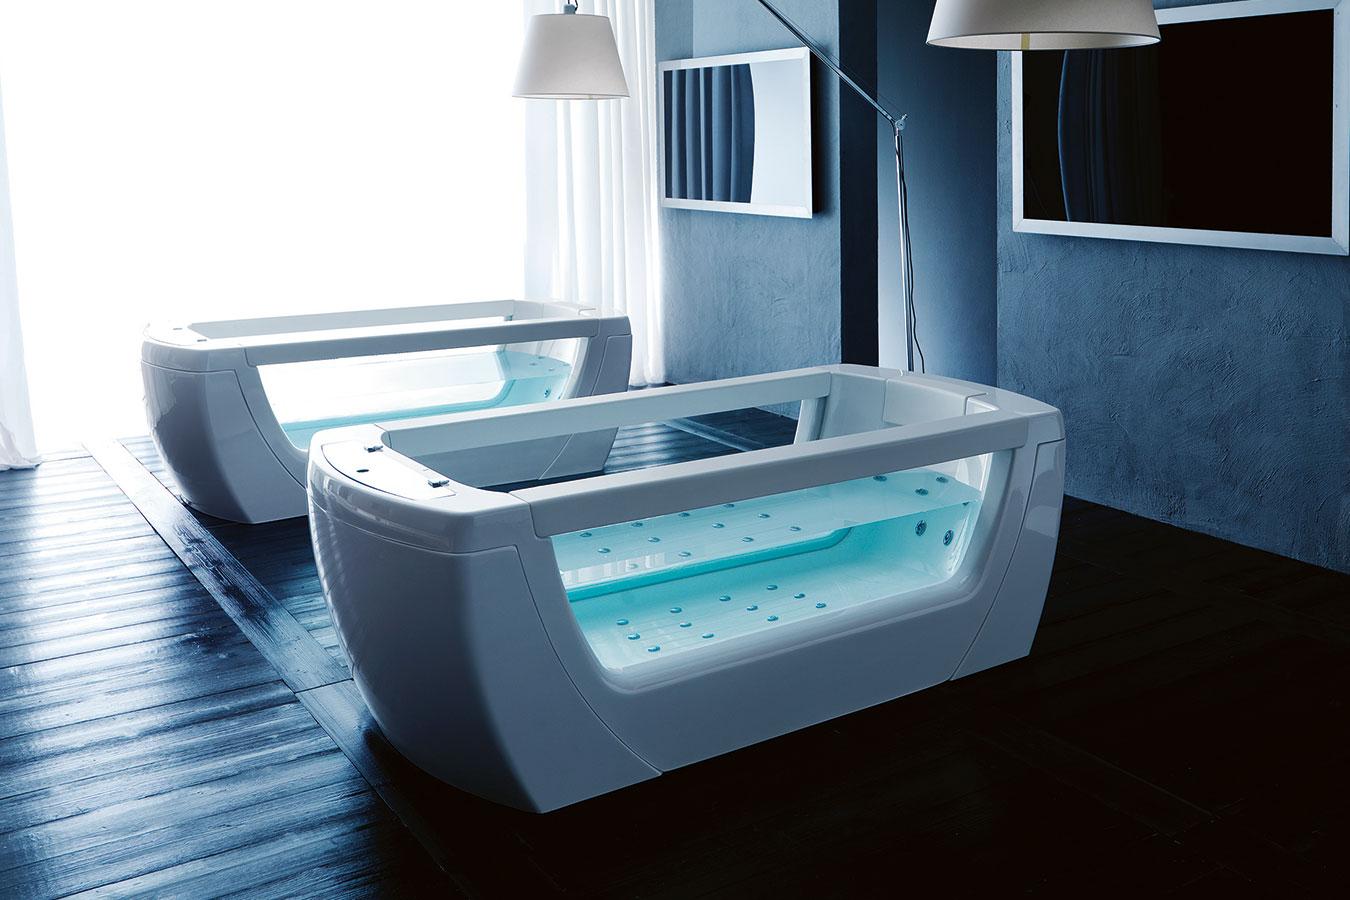 Vasche Da Bagno Da Incasso Piccole : Vasca da bagno ad incasso top vasca da bagno angolare piccola